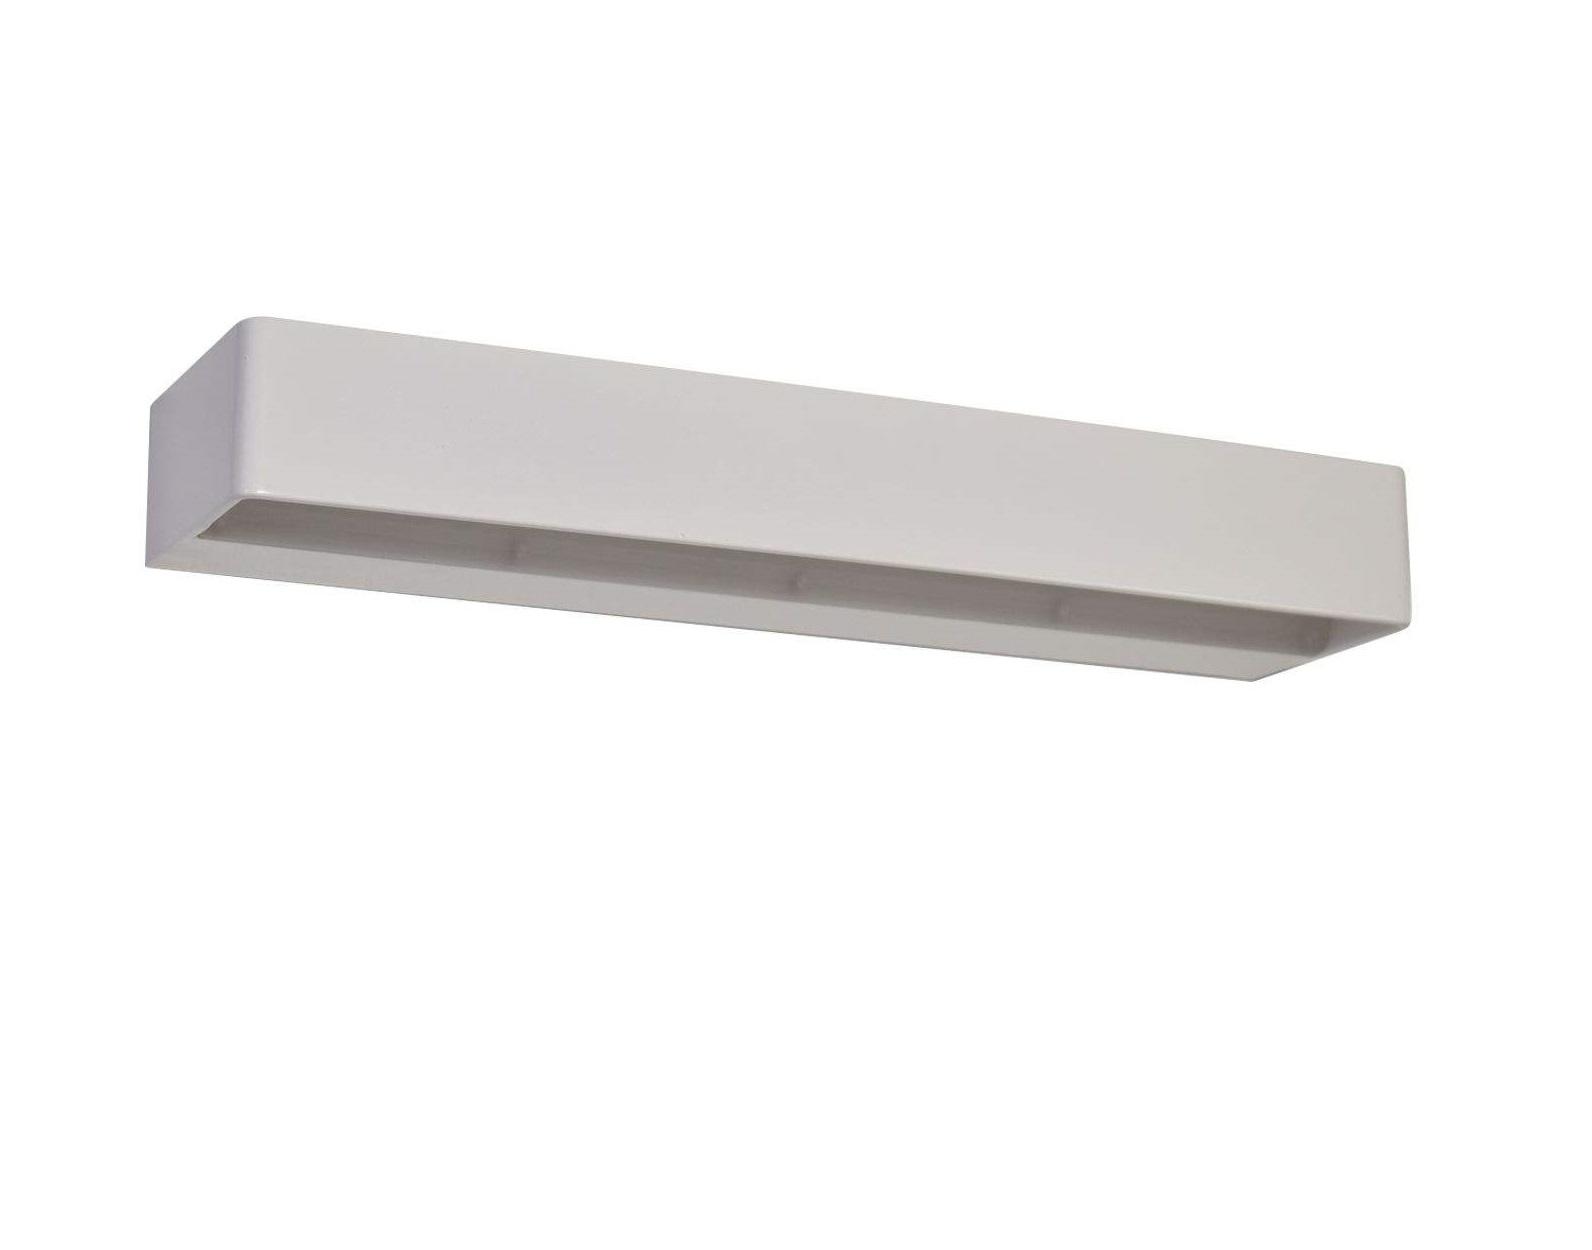 چراغ دیواری - WL-R-9703